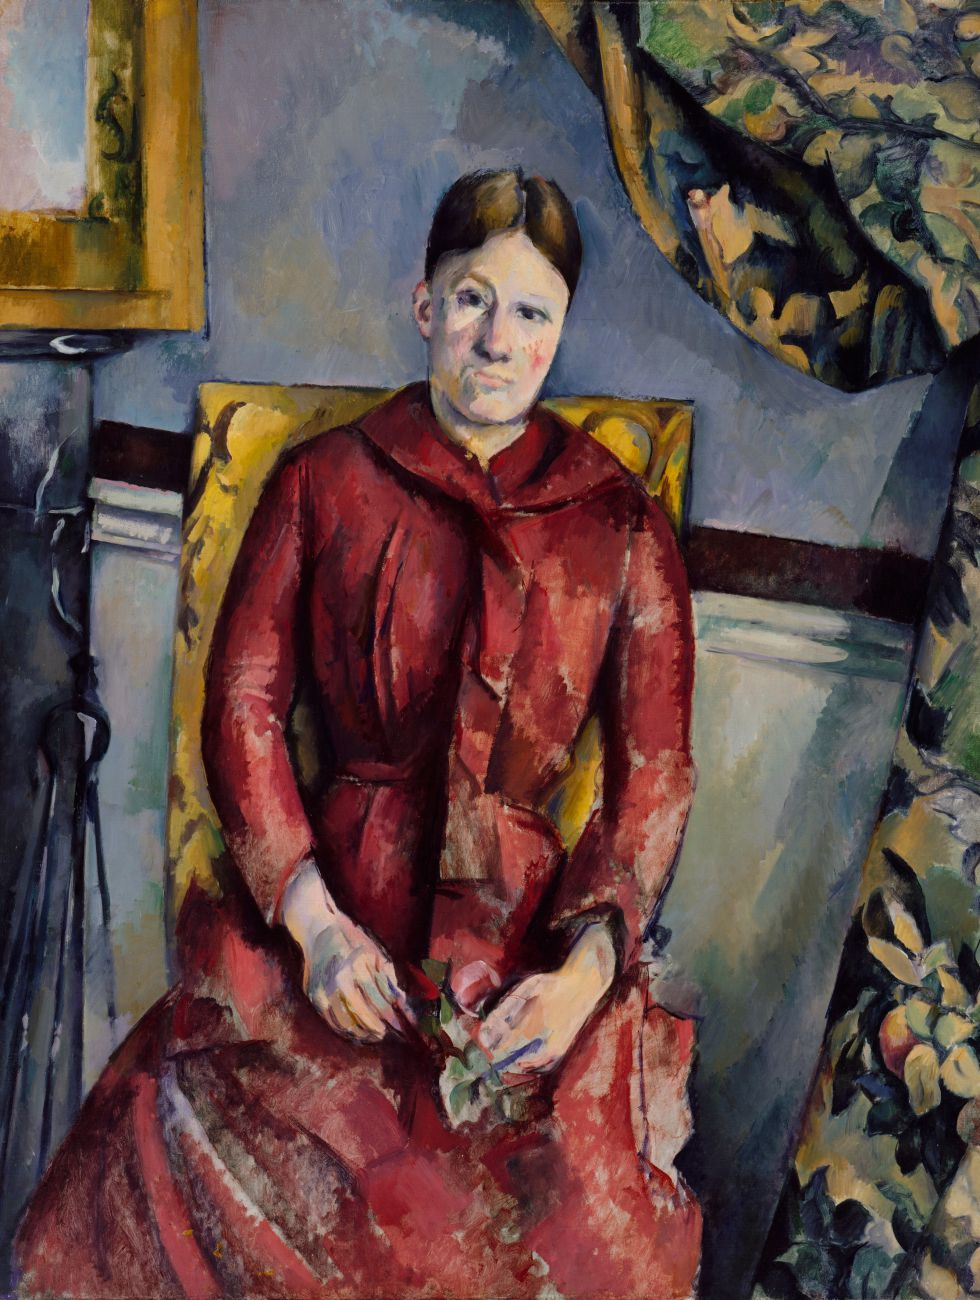 'Madame Cézanne, con un vestido rojo' (1888-90), de Cézanne. / THE METROPOLITAN MUSEUM OF ART